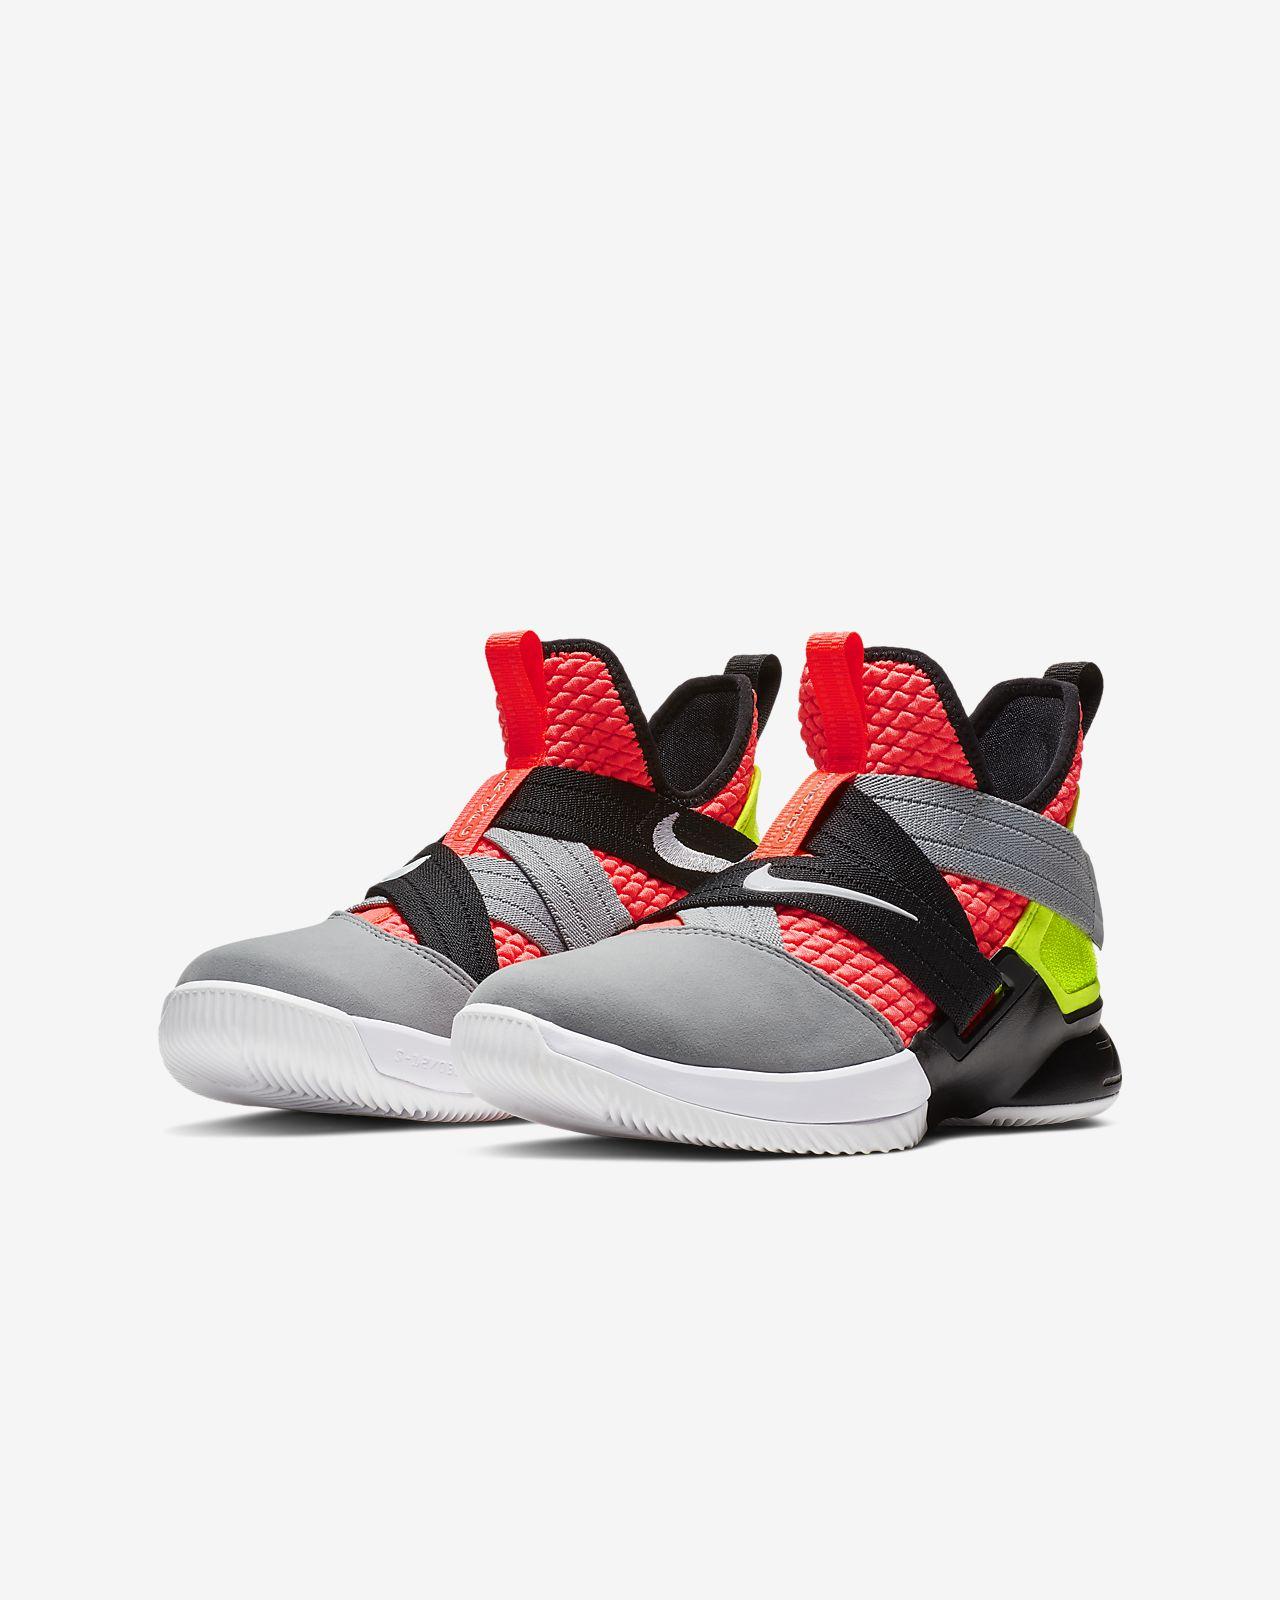 96839fc6ec350 LeBron Soldier 12 SFG Big Kids  Basketball Shoe. Nike.com